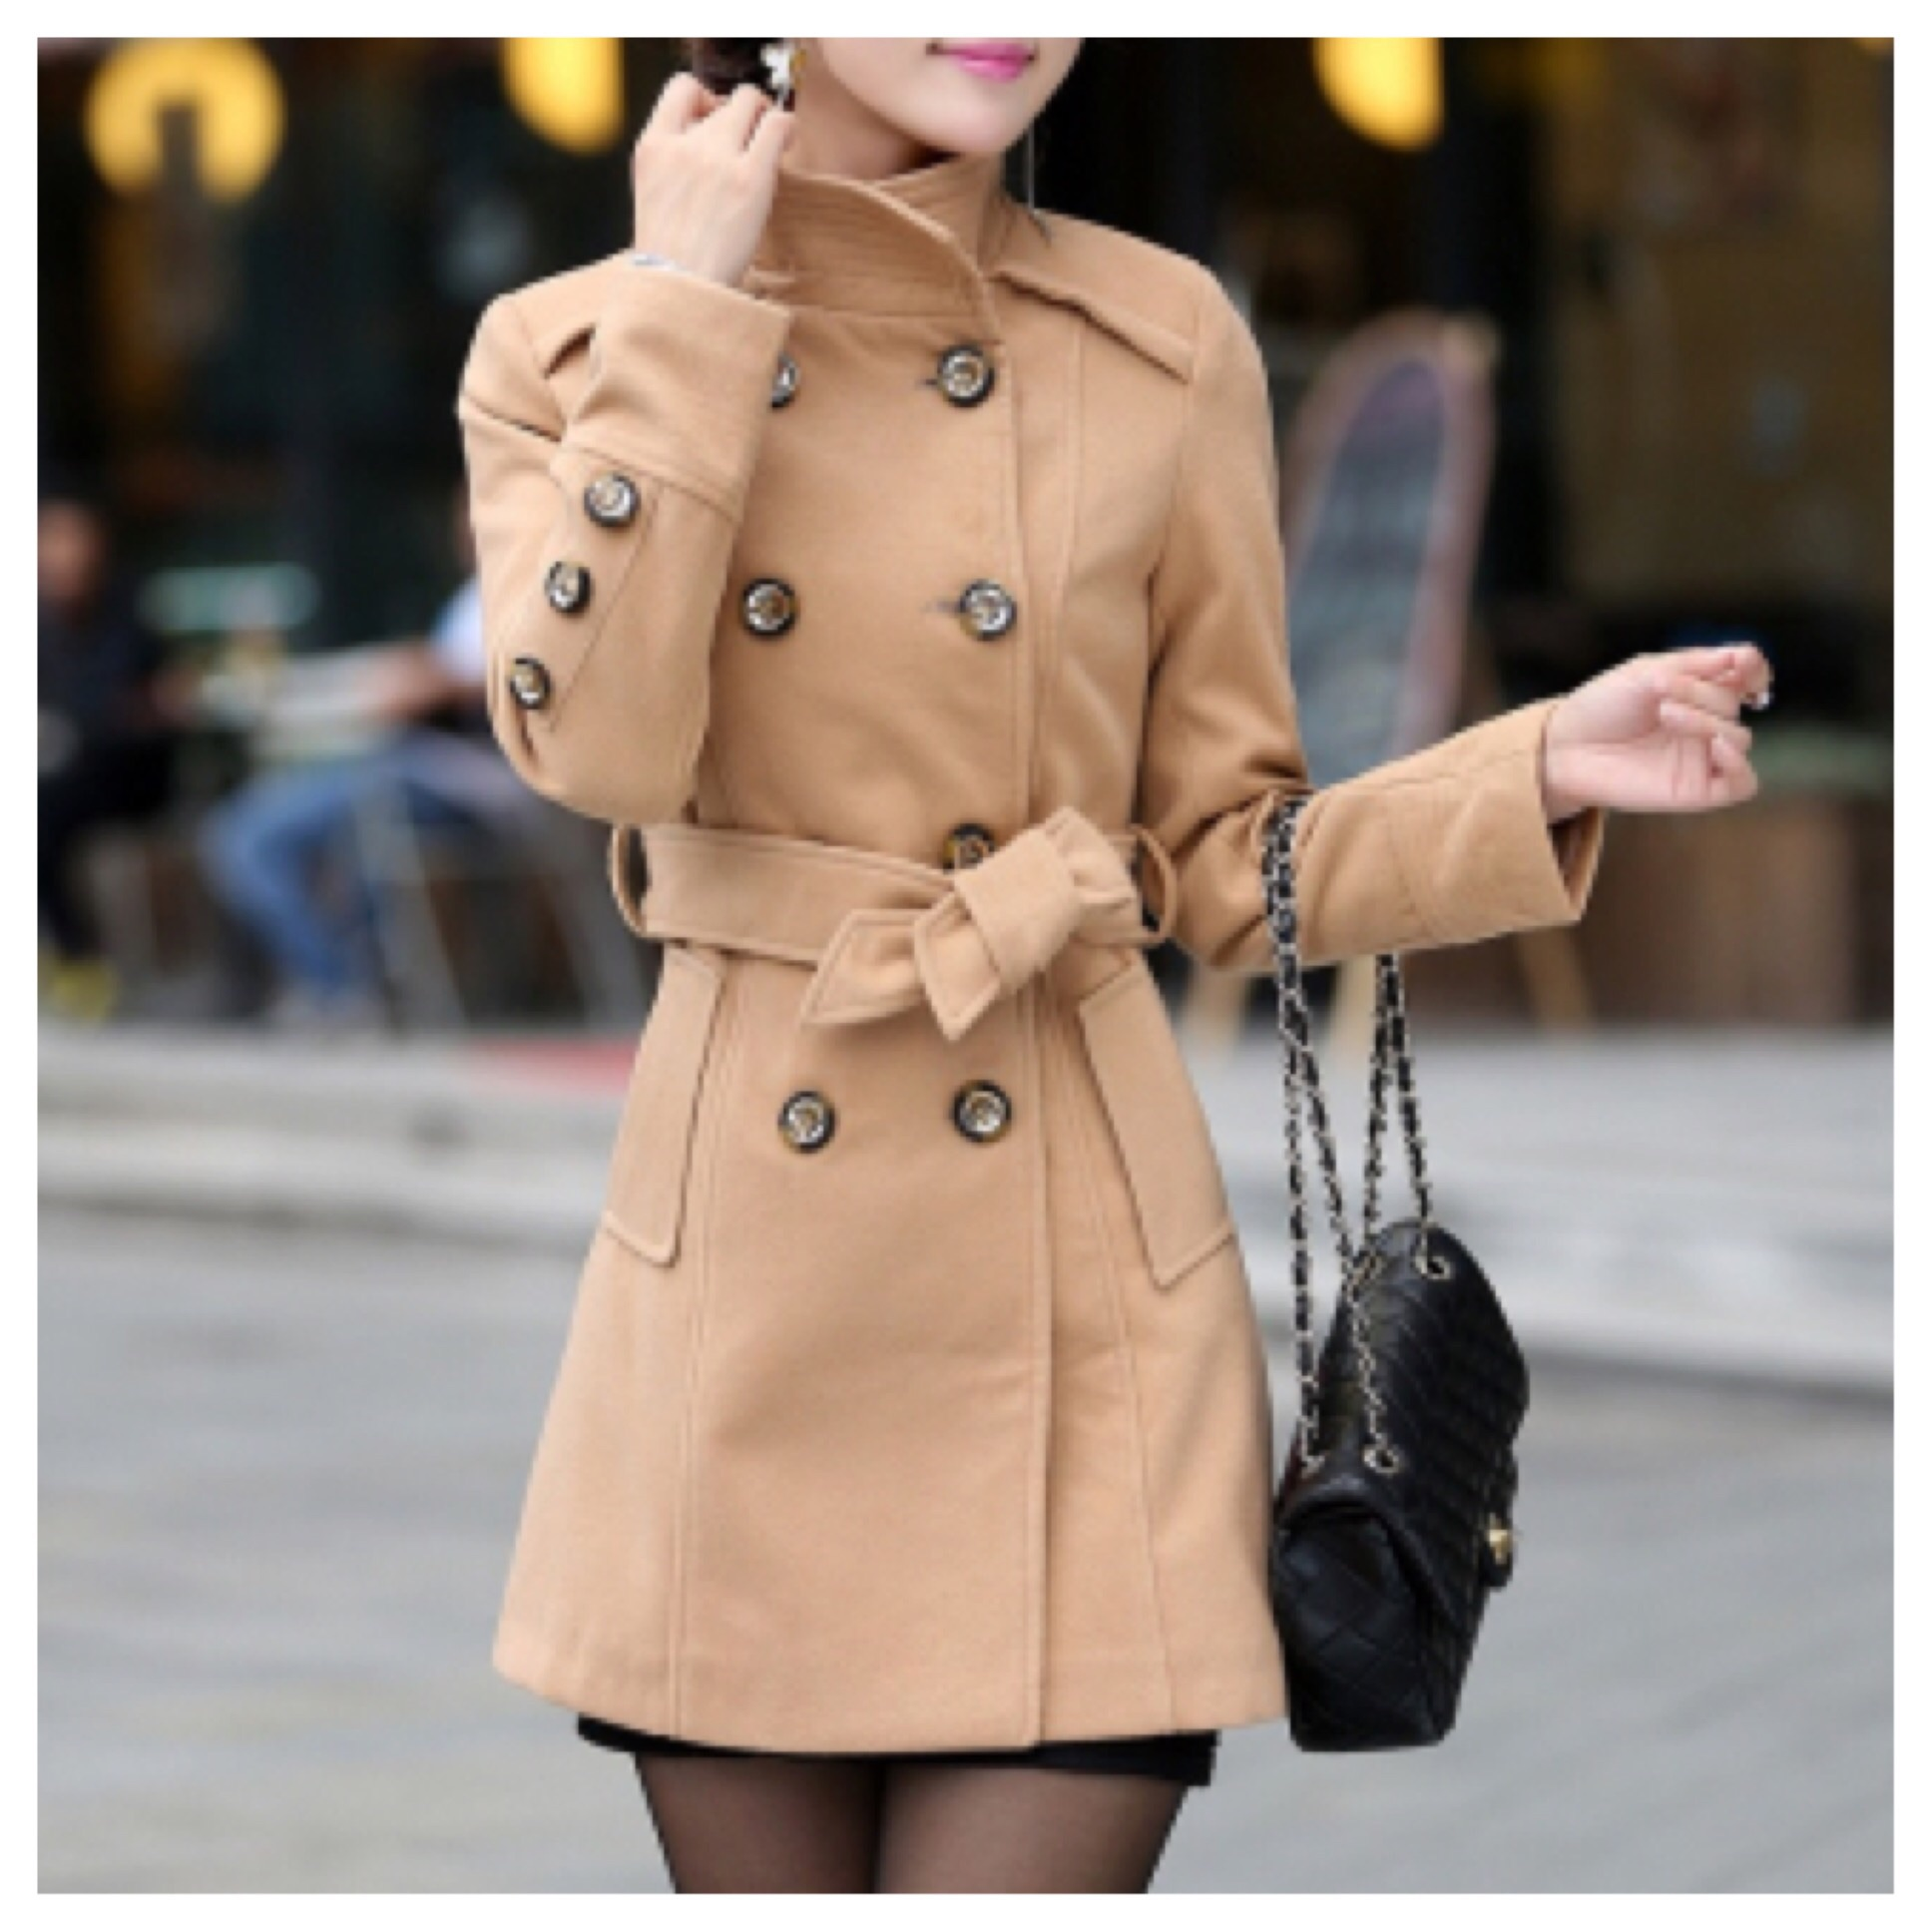 Tan belted high collar wool jacket